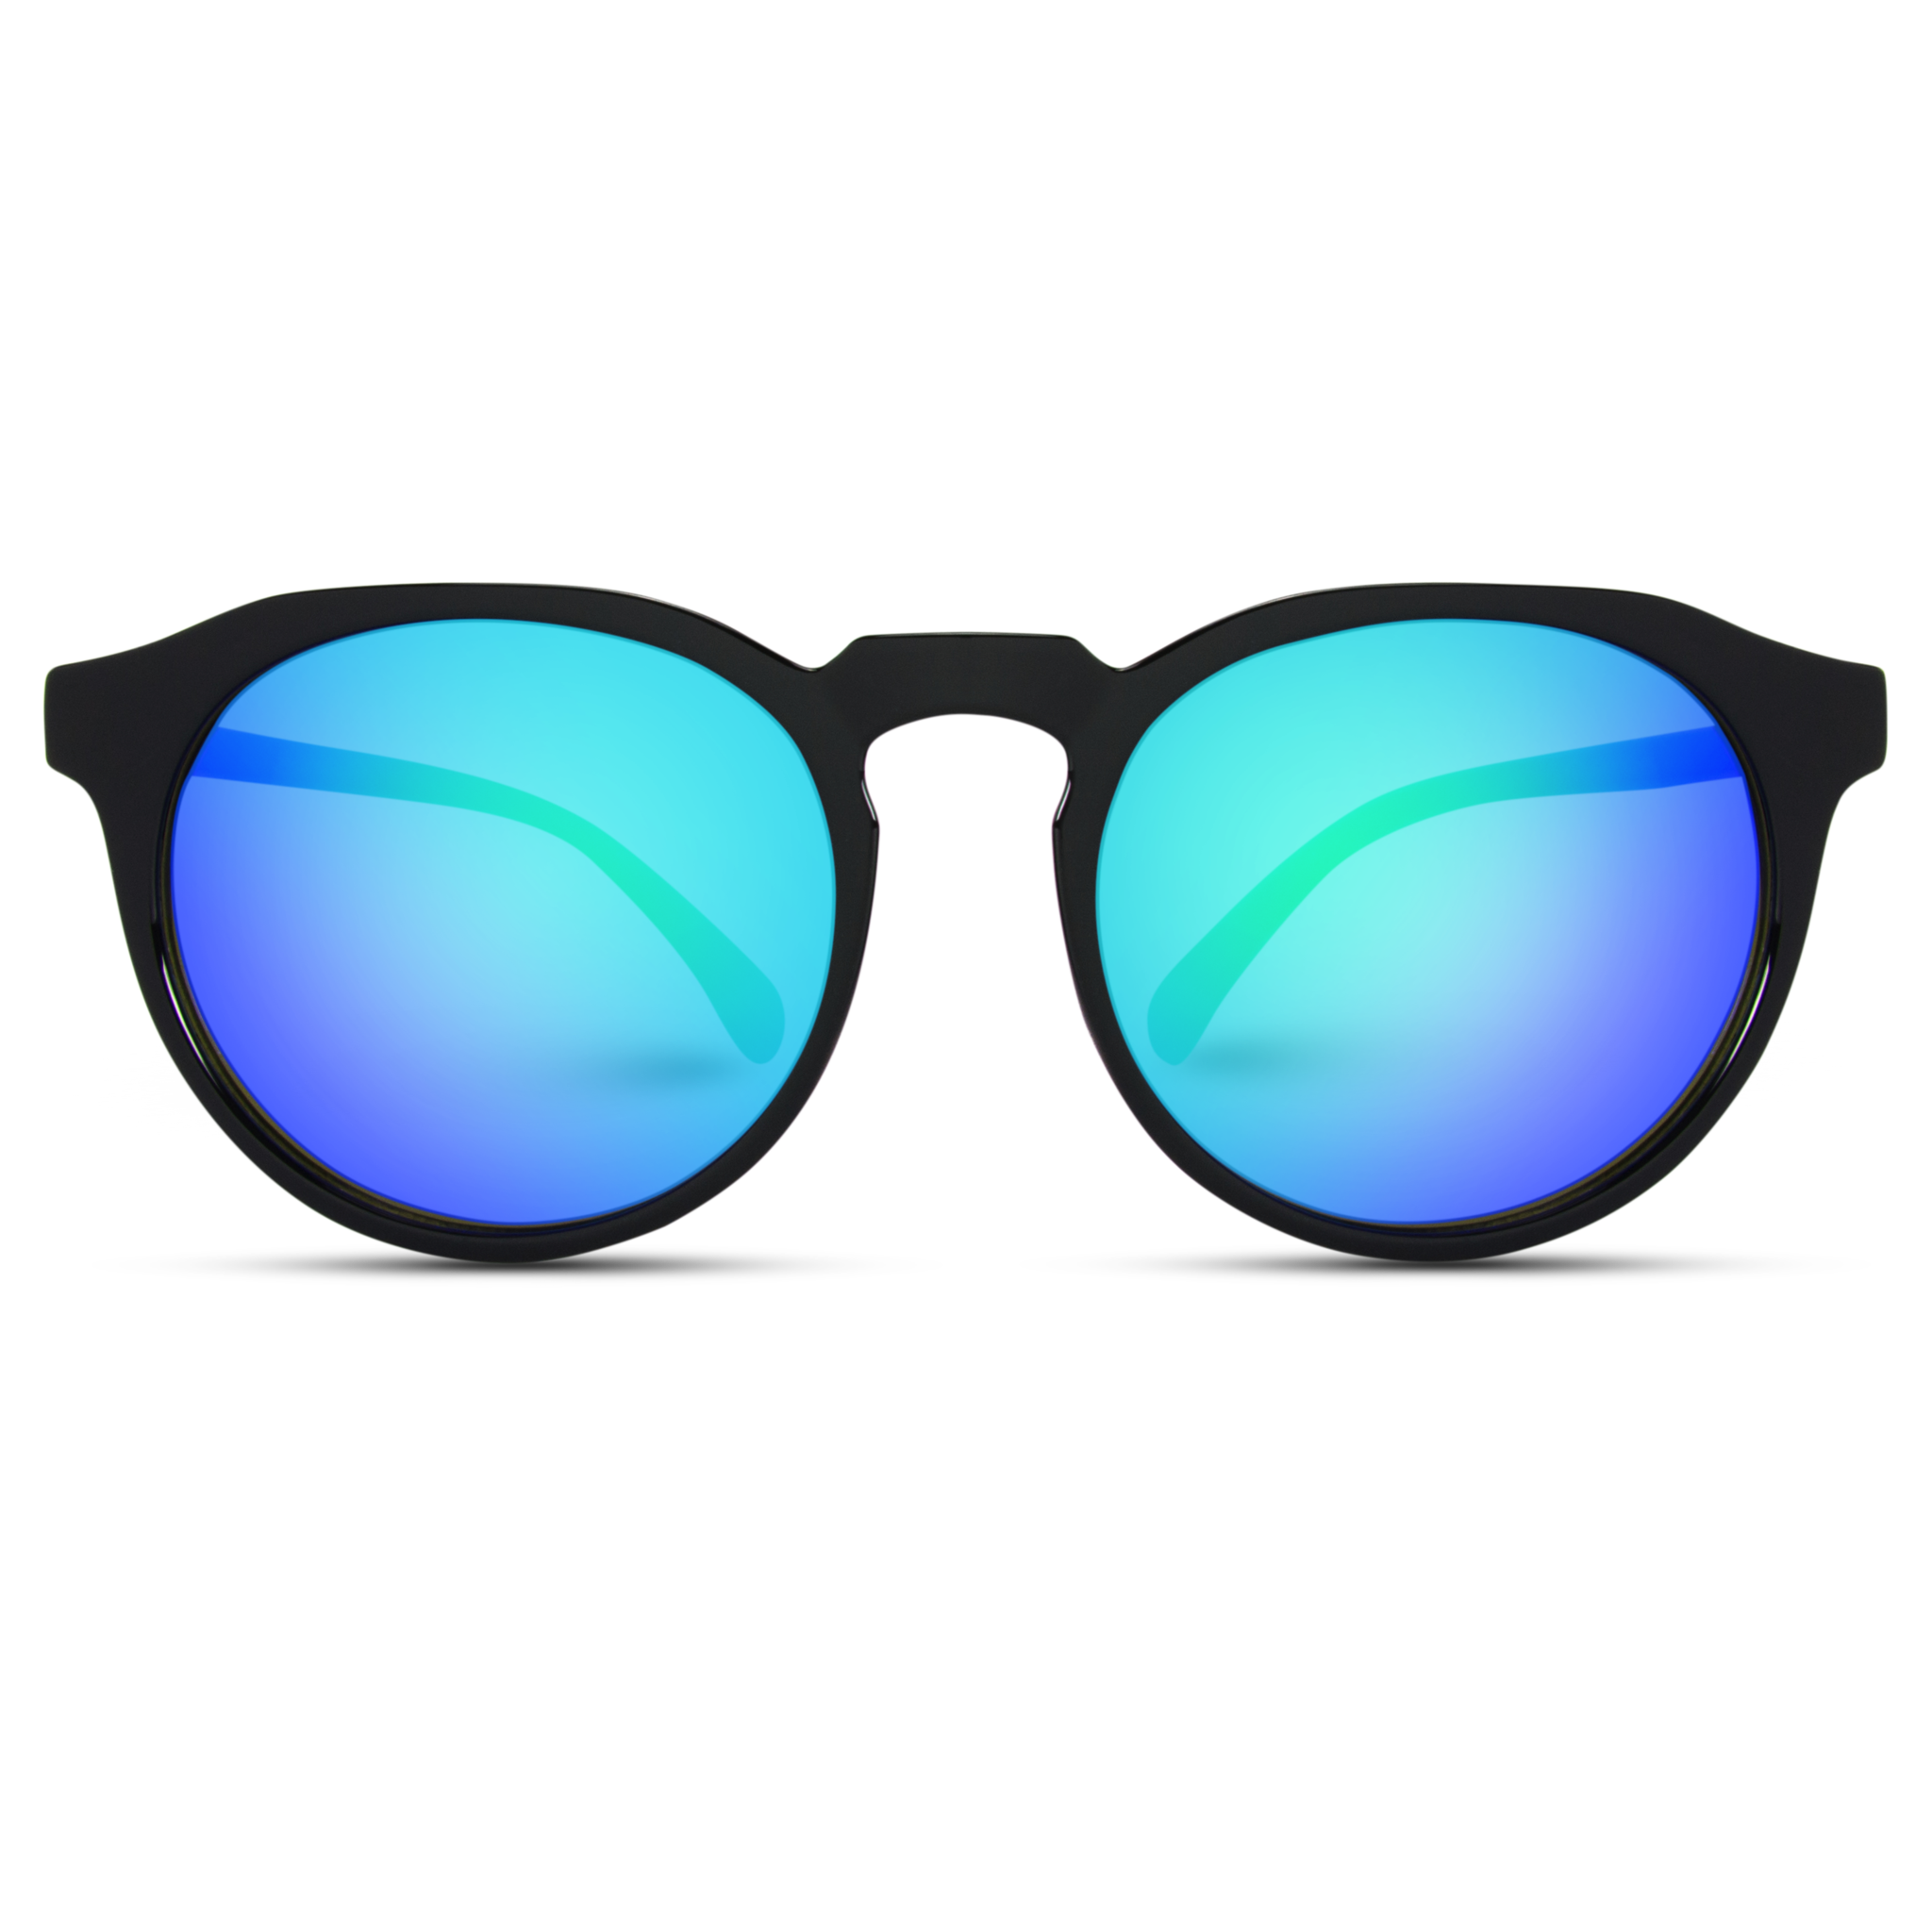 Cameron Round Retro Flat Top Mirrored Unisex Sunglasses Sunglasses Fashion Mirror Sunglass Frames